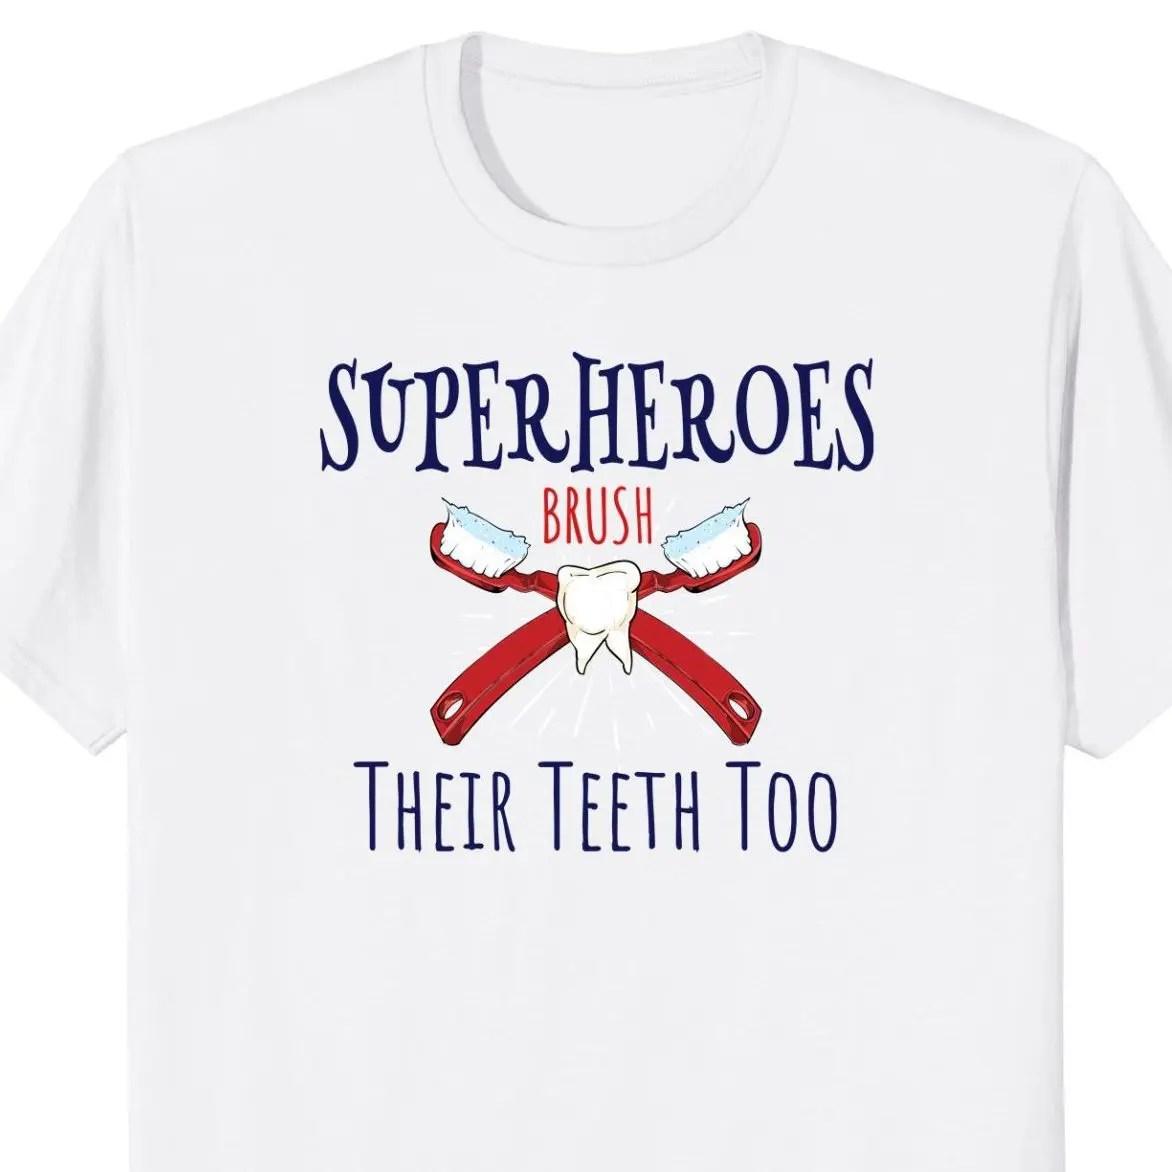 Superhero's Brush Their Teeth Too T-Shirt